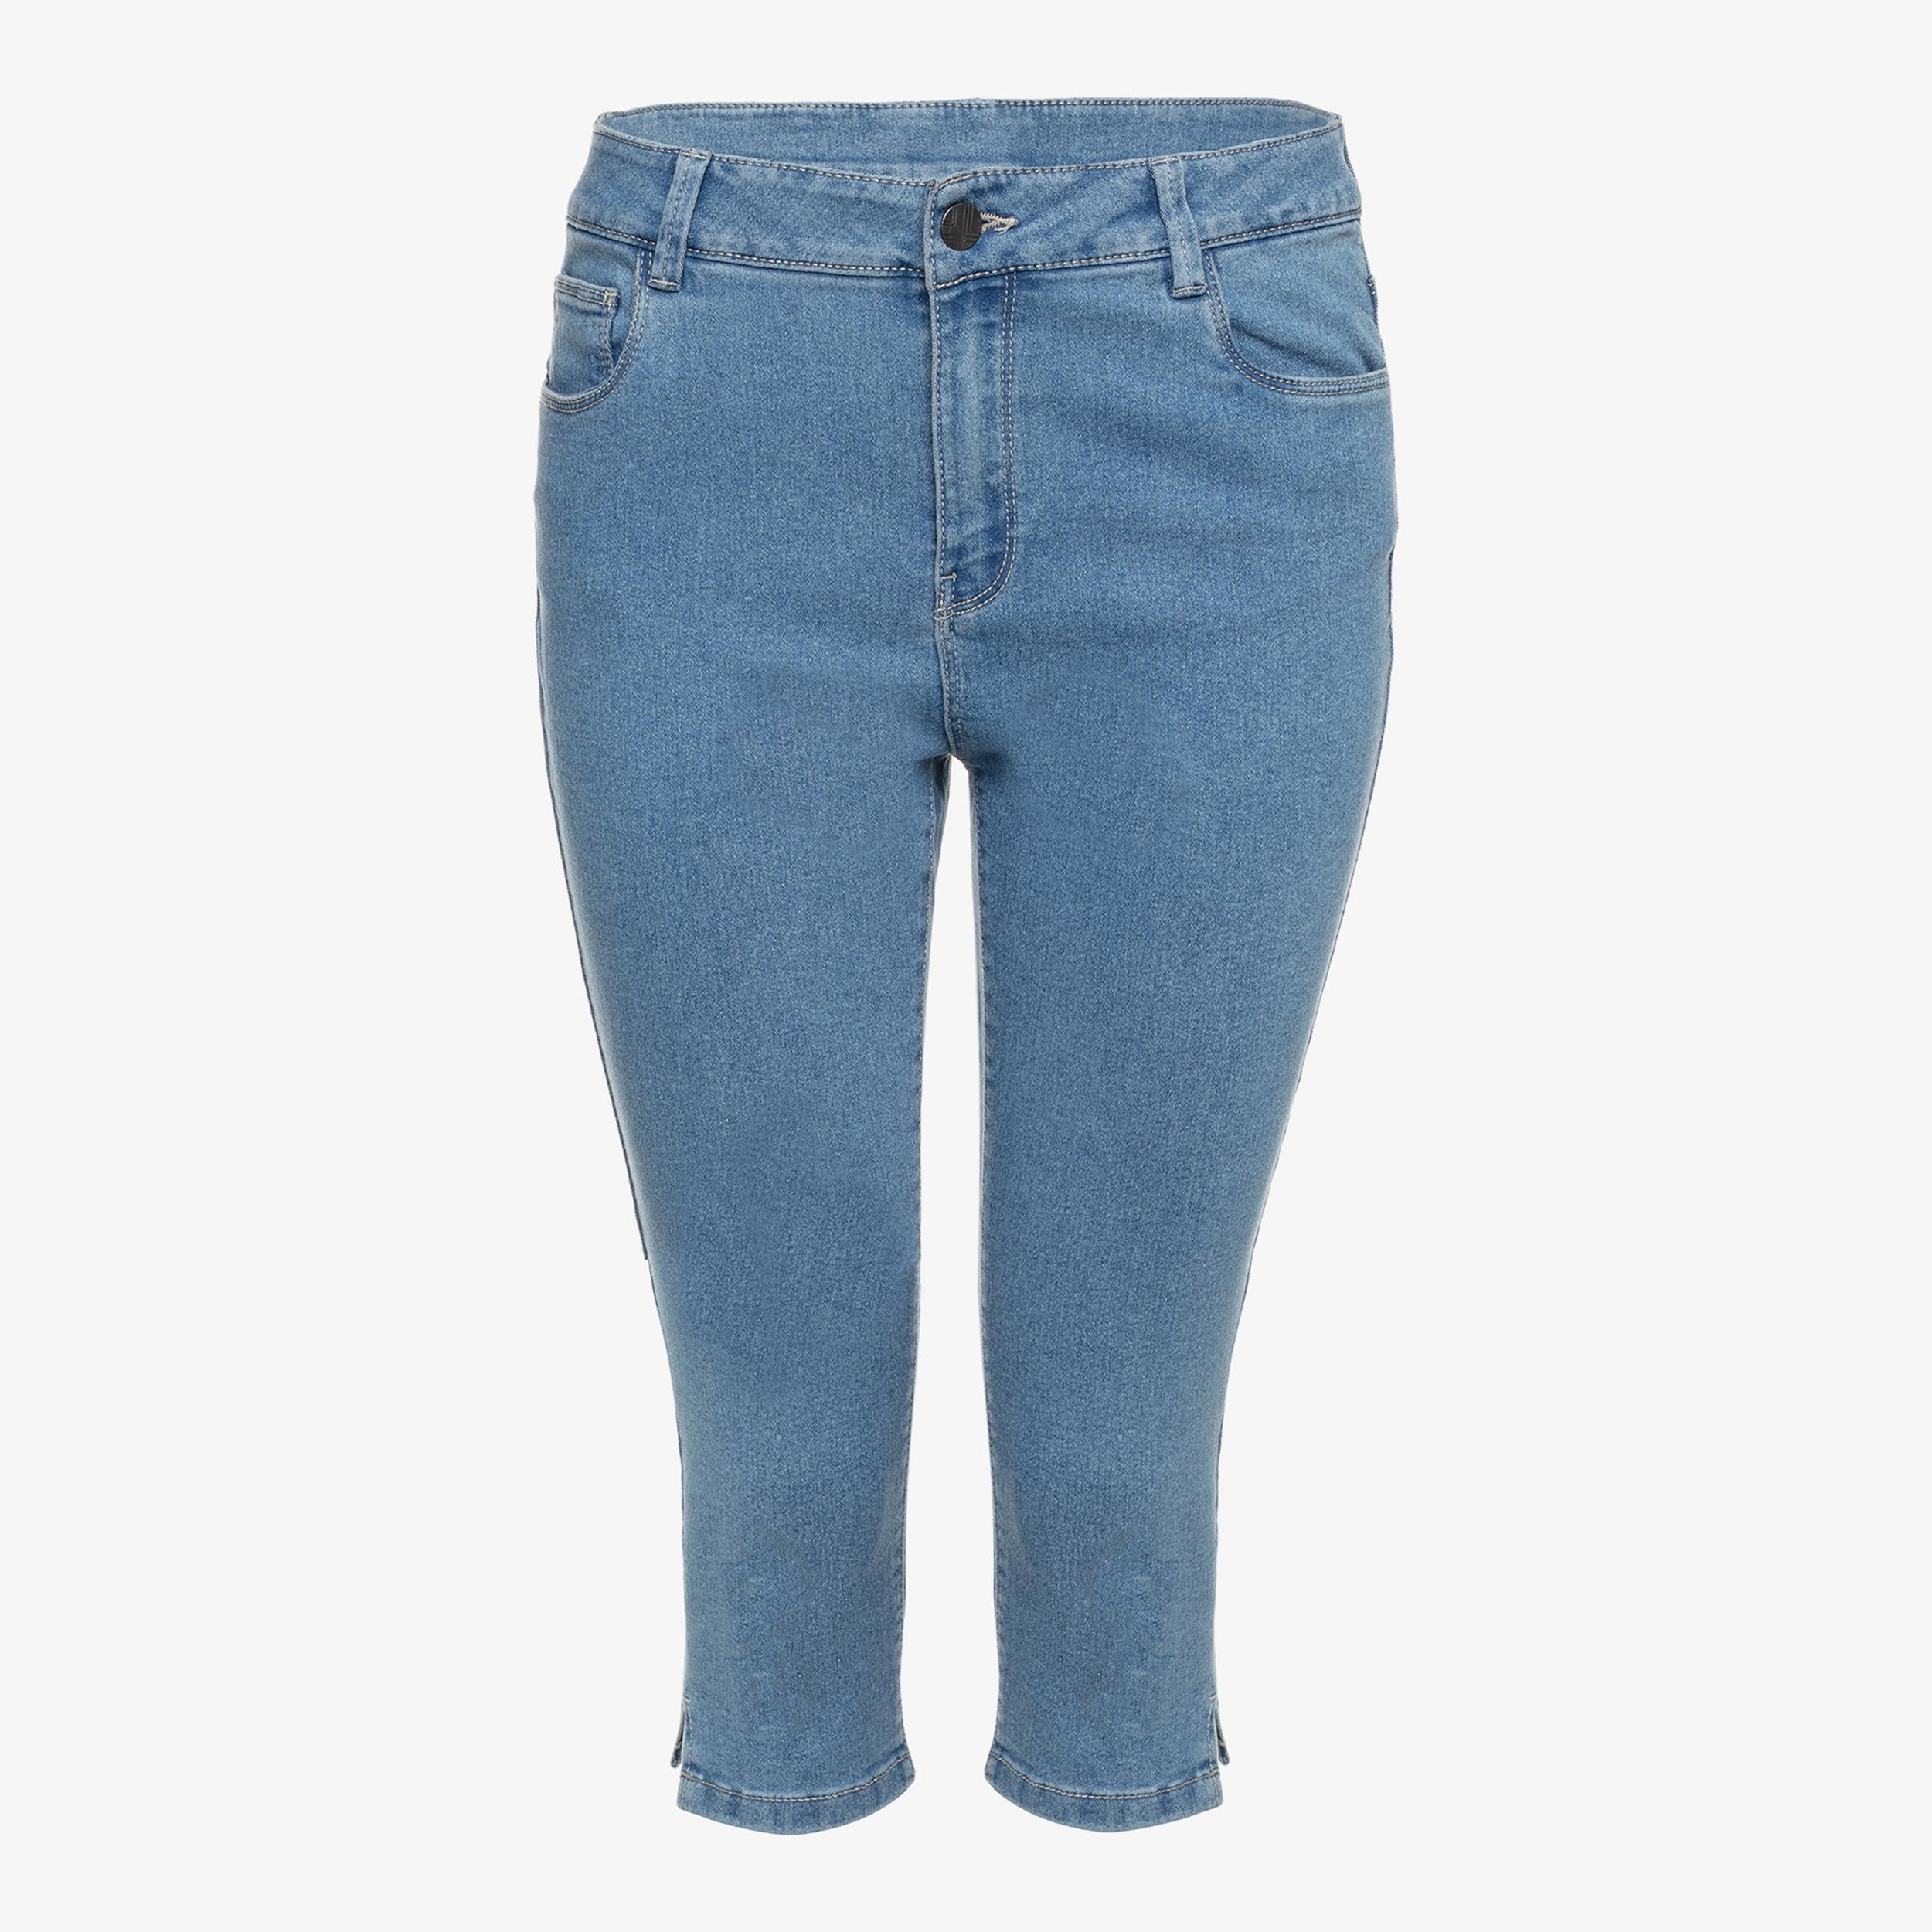 Jazlyn dames capri jeans